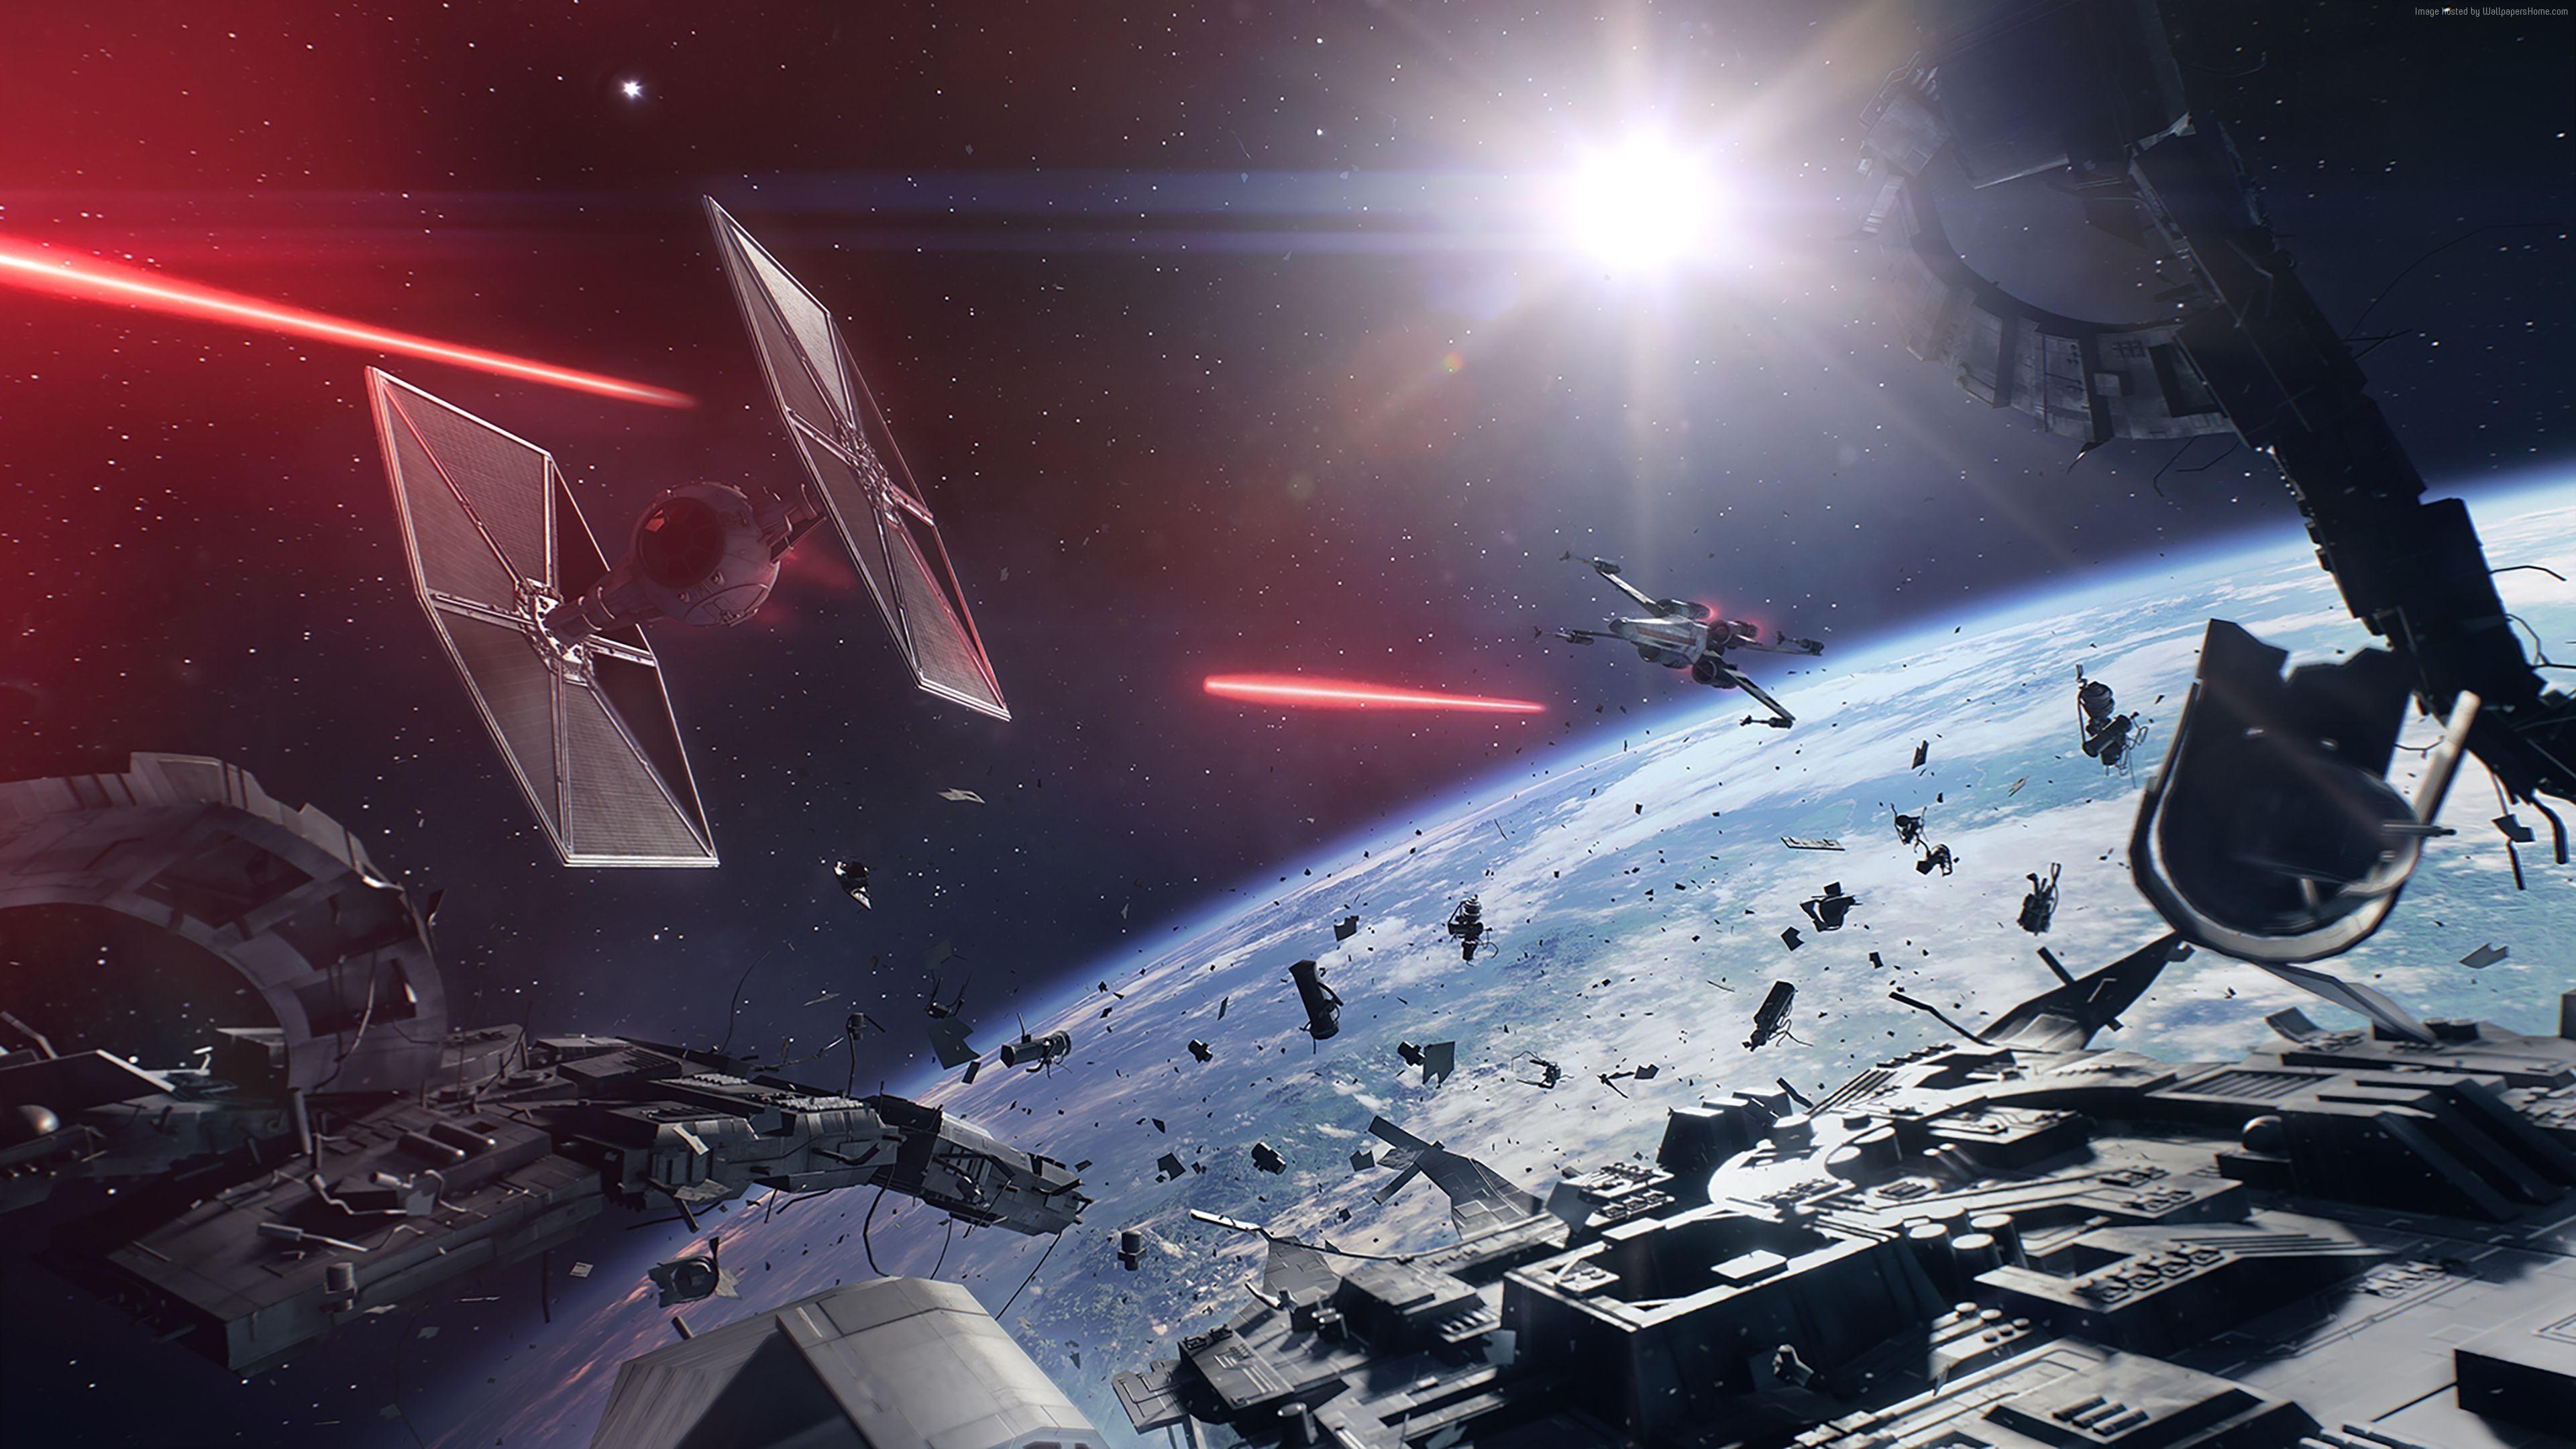 Star Wars Battlefront II 4K Wallpaper